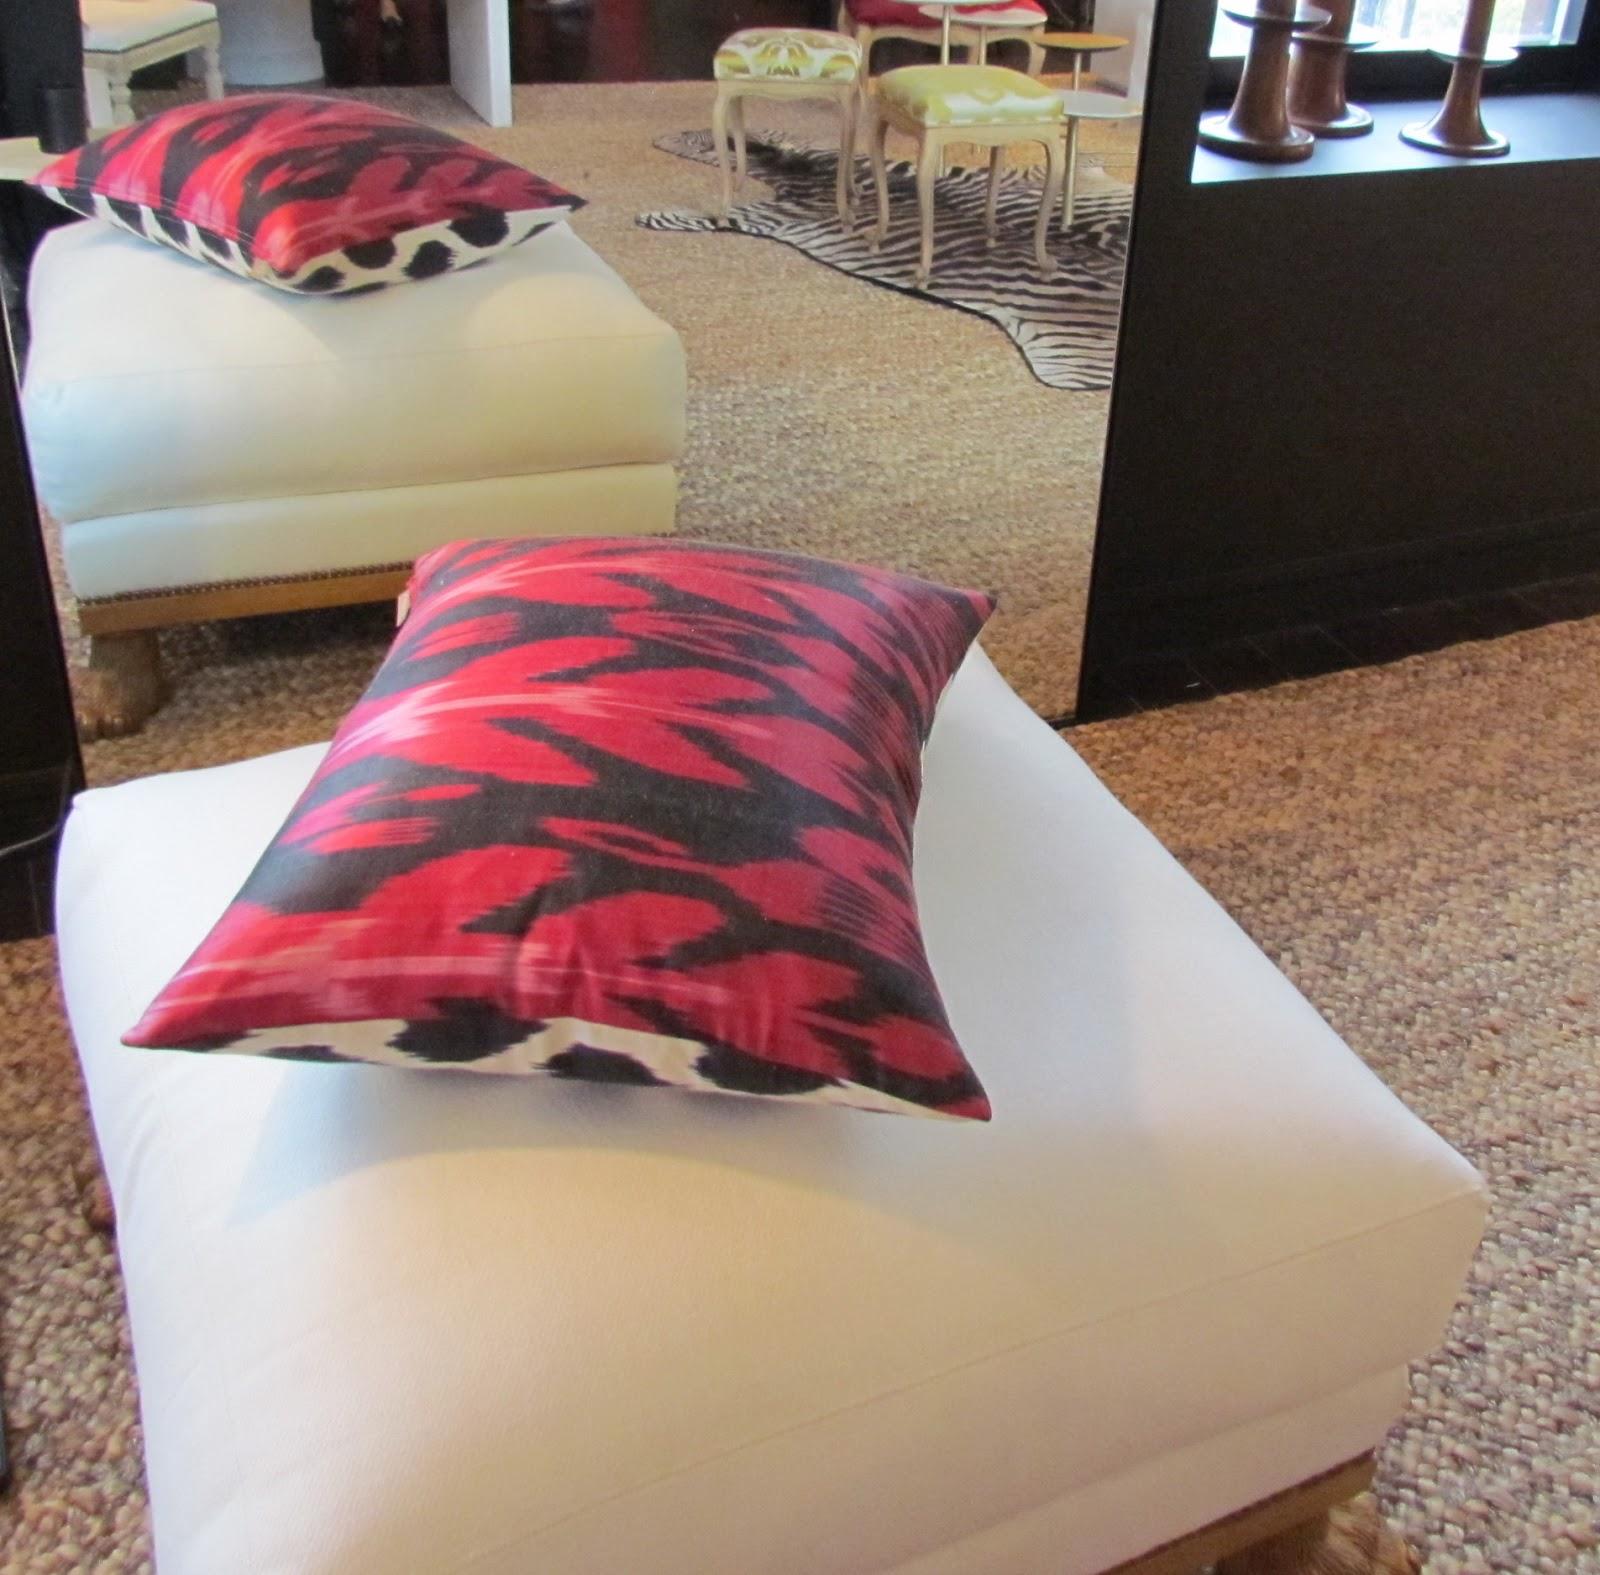 Antony Todd Sofa Average Length Of A 3 Seater Dec Porter Imagination Home Designer Visions